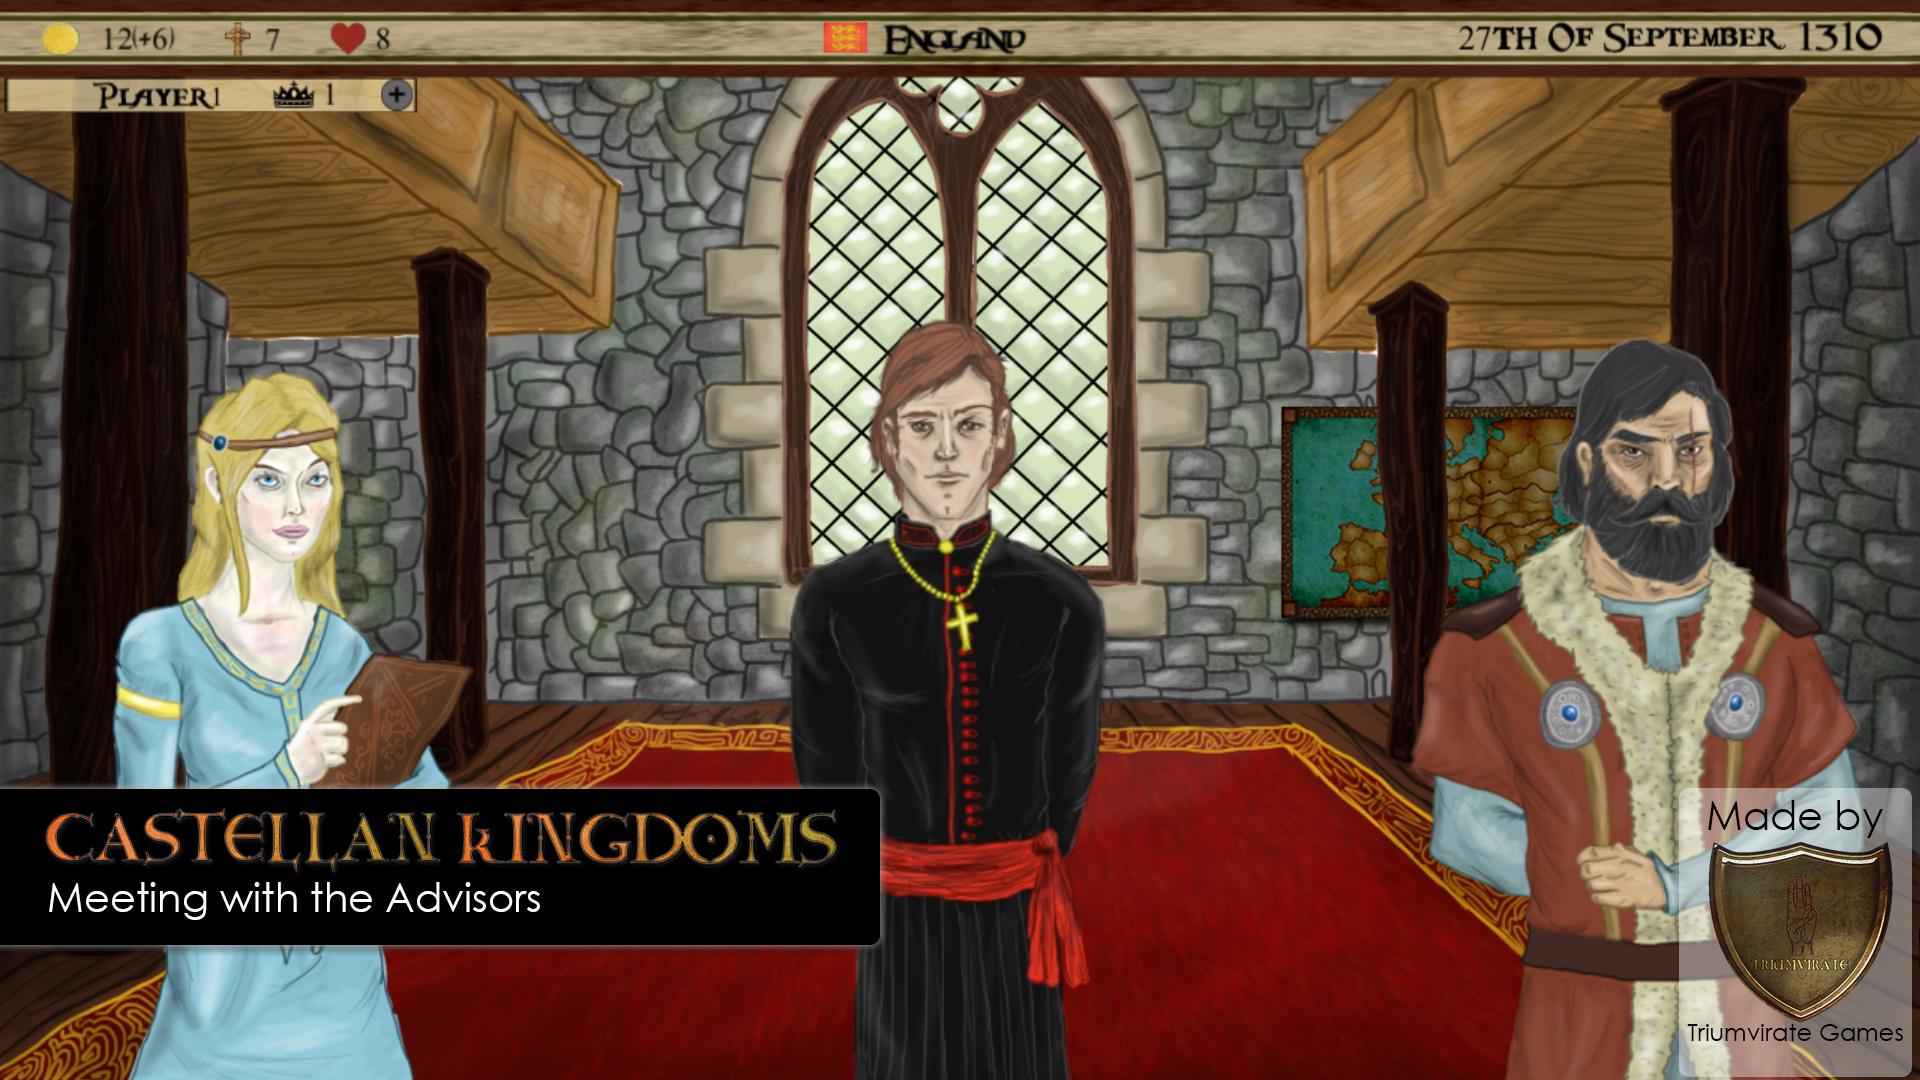 Castellan Kingdoms advisors